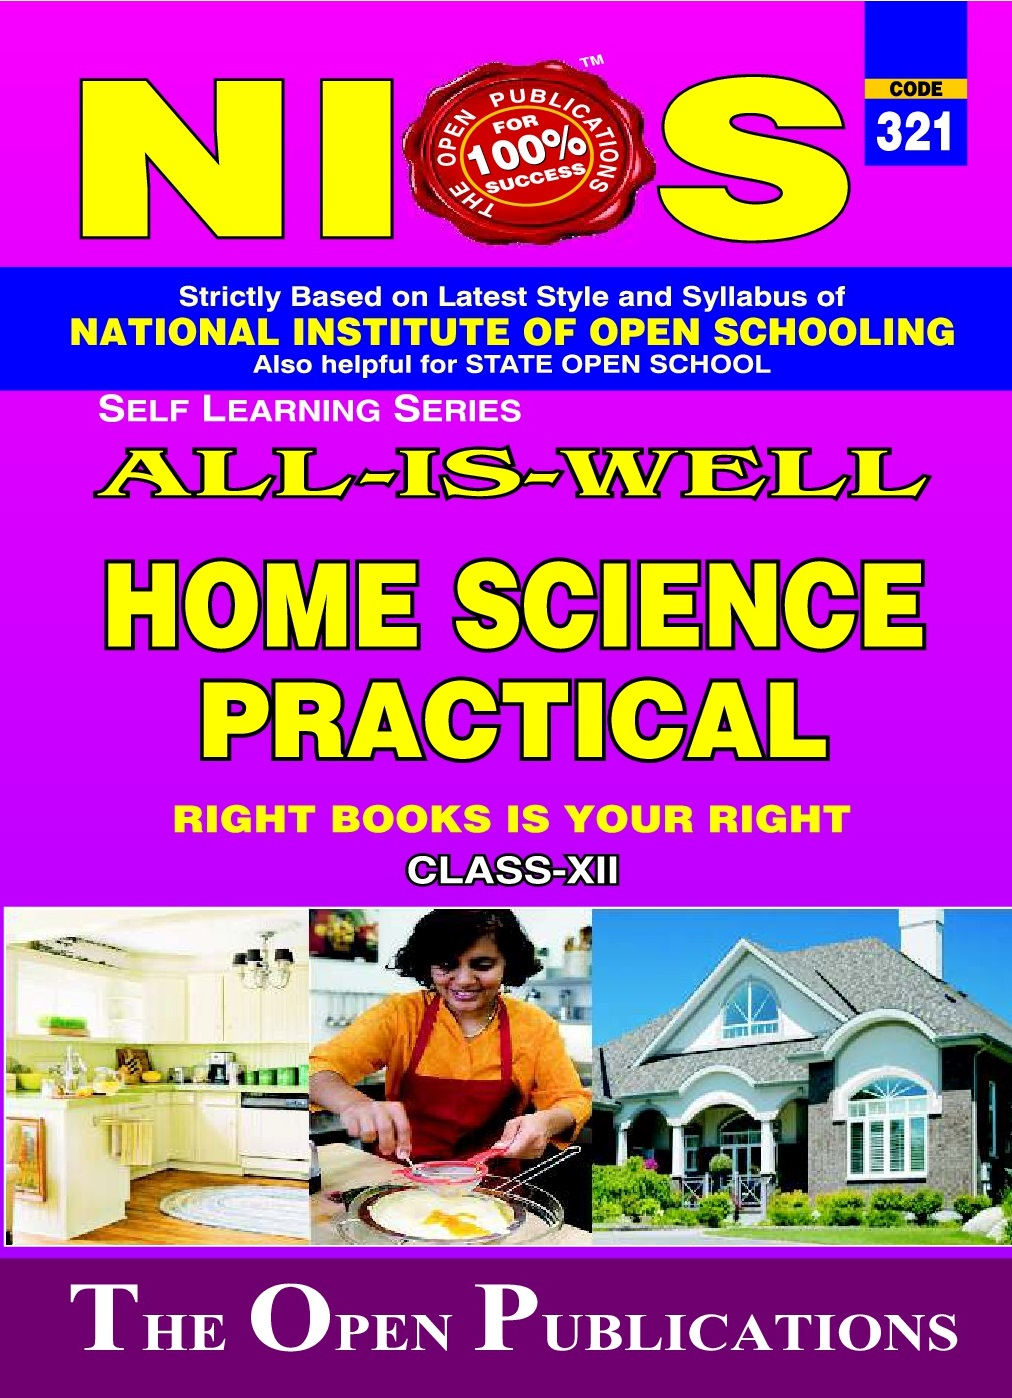 NIOS PRACTICAL MANUAL HOME SCIENCE 321 HELP BOOK IN ENGLISH MEDIUM